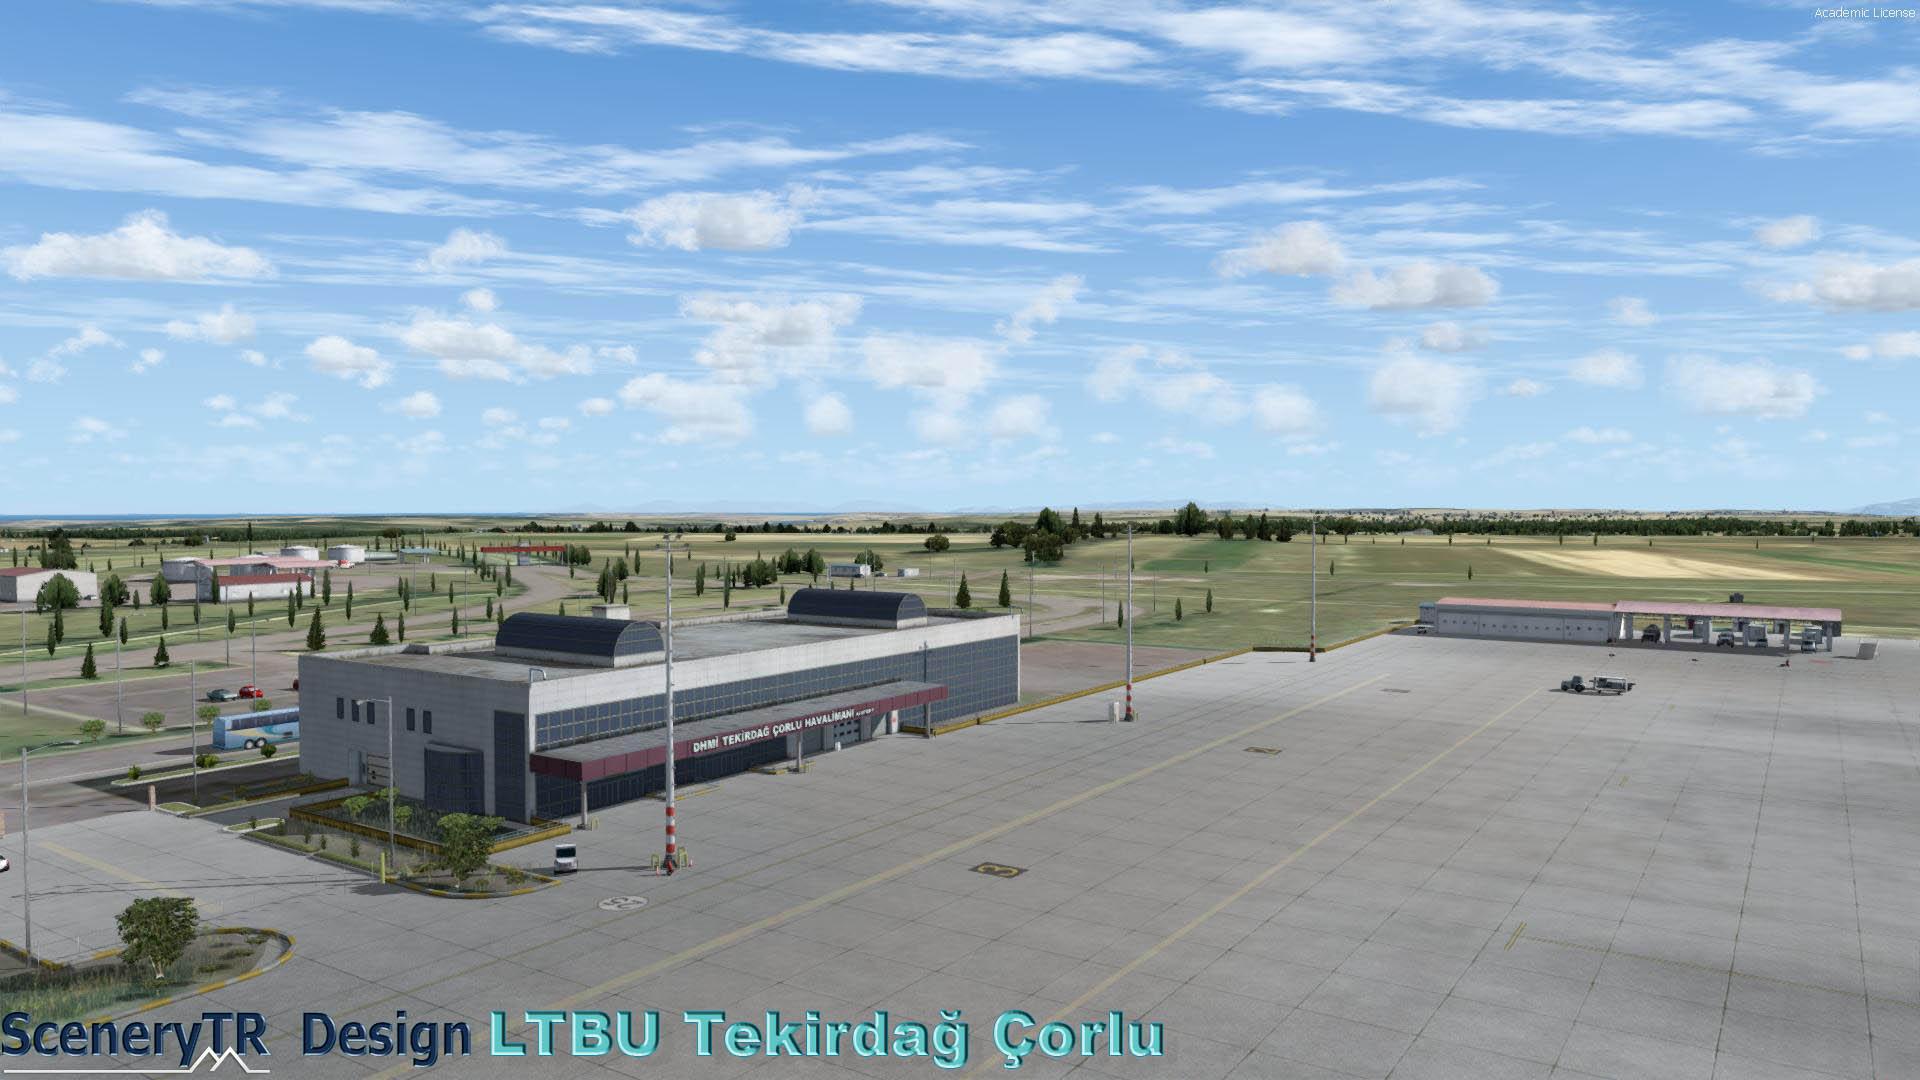 LTBUX04